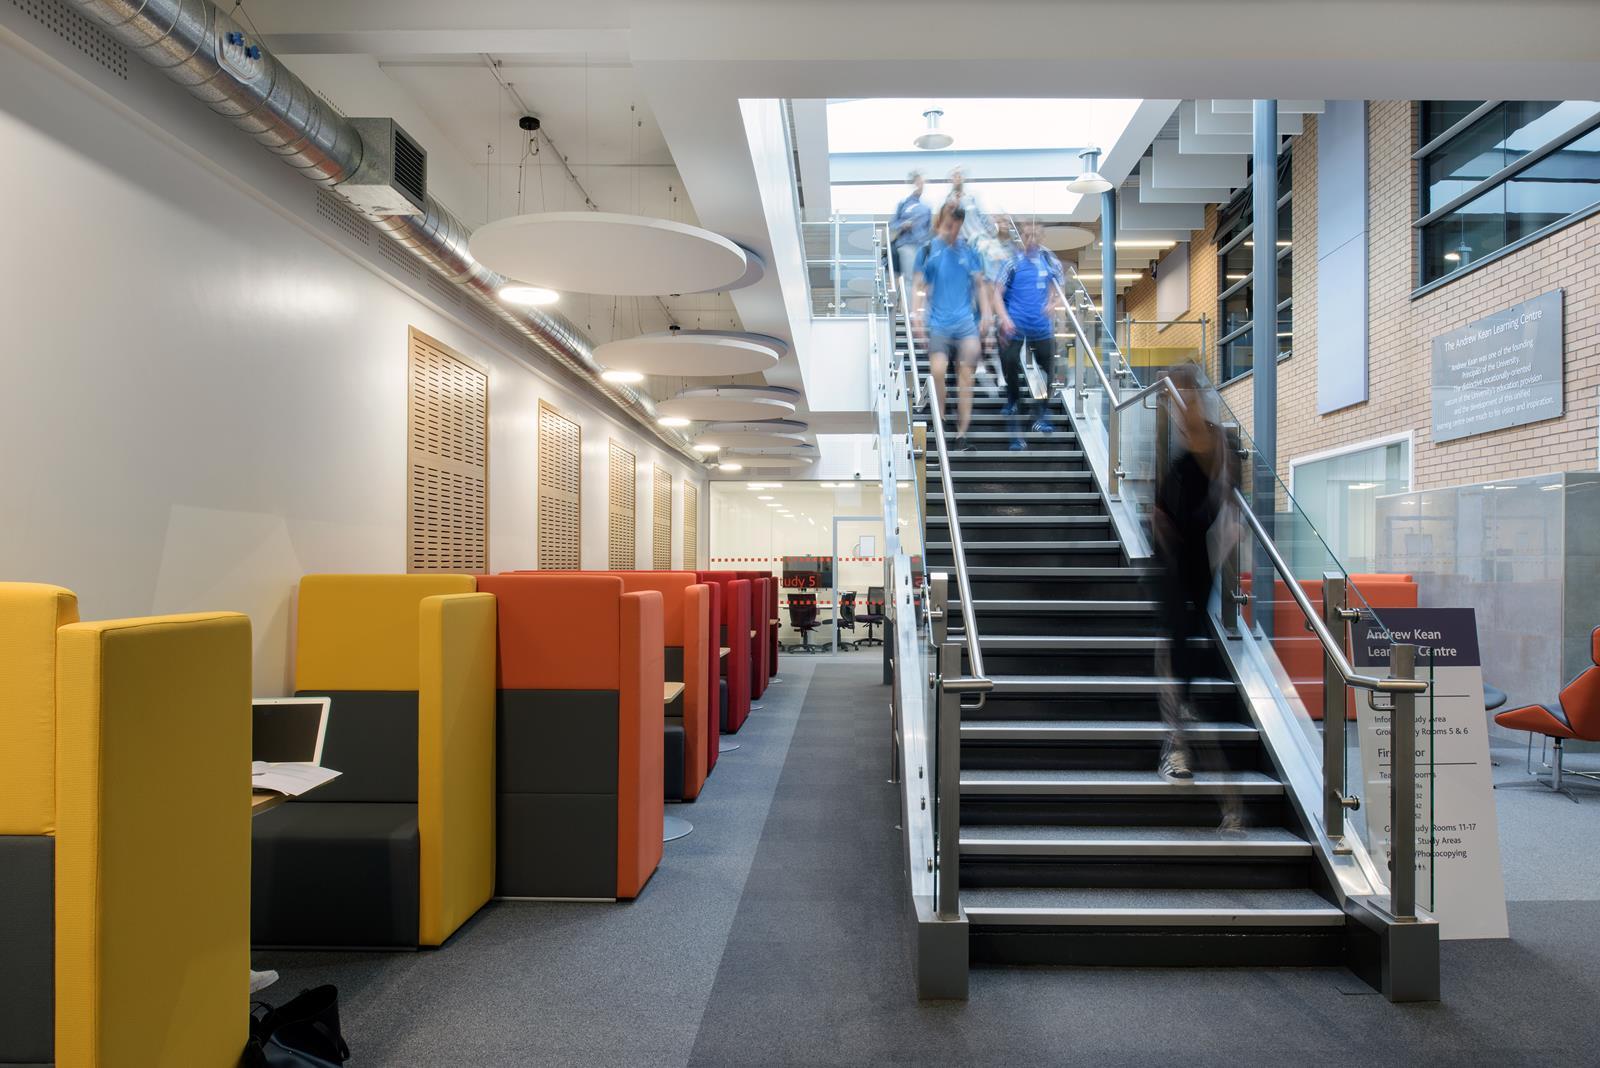 Andrew Kean Learning Centre by Jefferson Sheard Architects